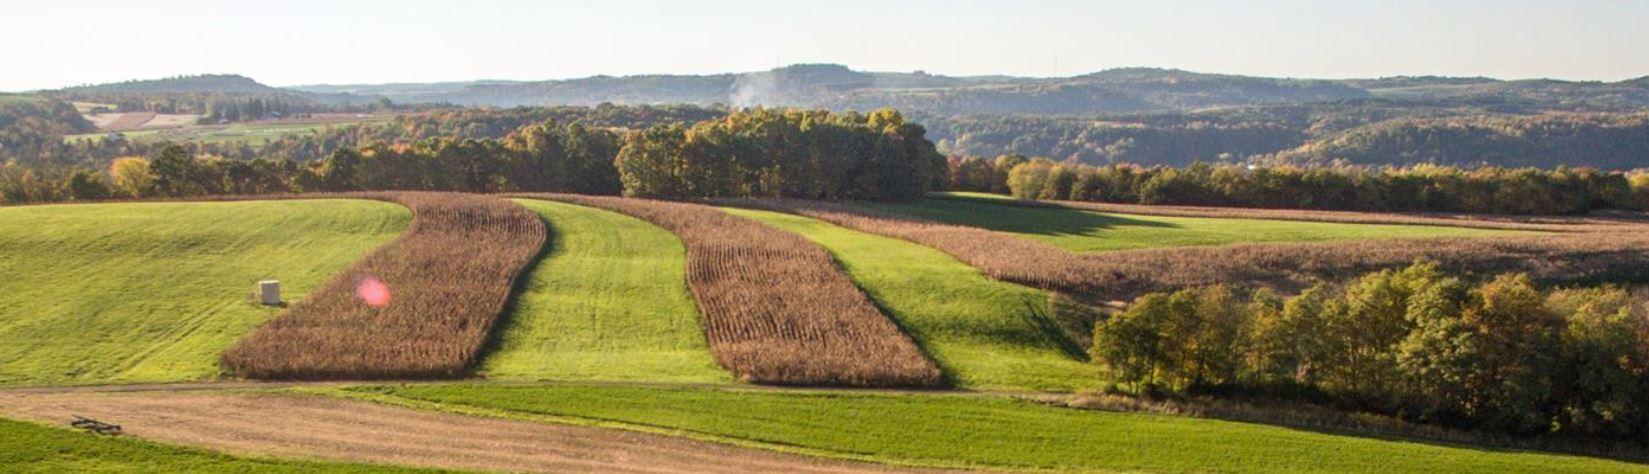 Pennsylvania farmland showing conservation best management practices